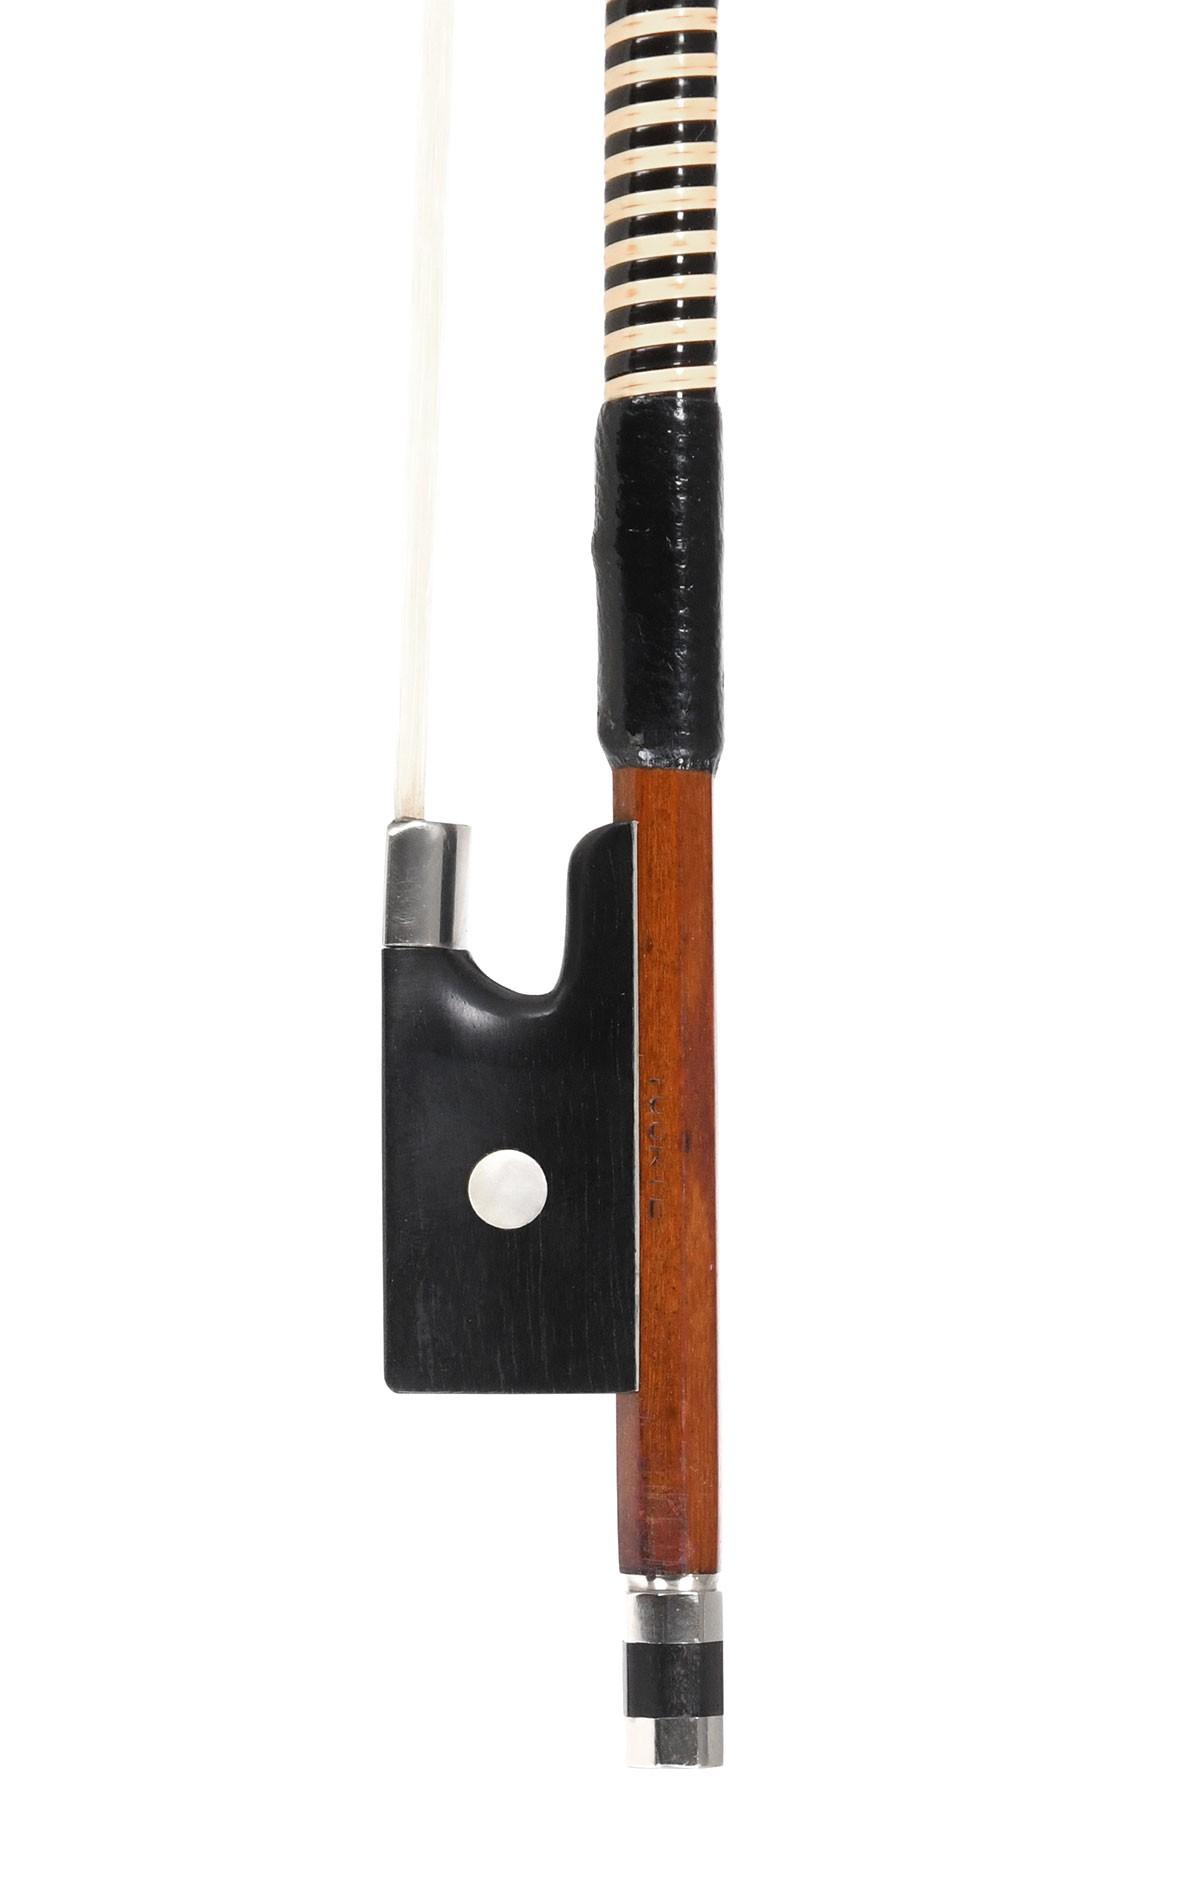 Lighteight German violin bow - Markneukirchen, 1950's